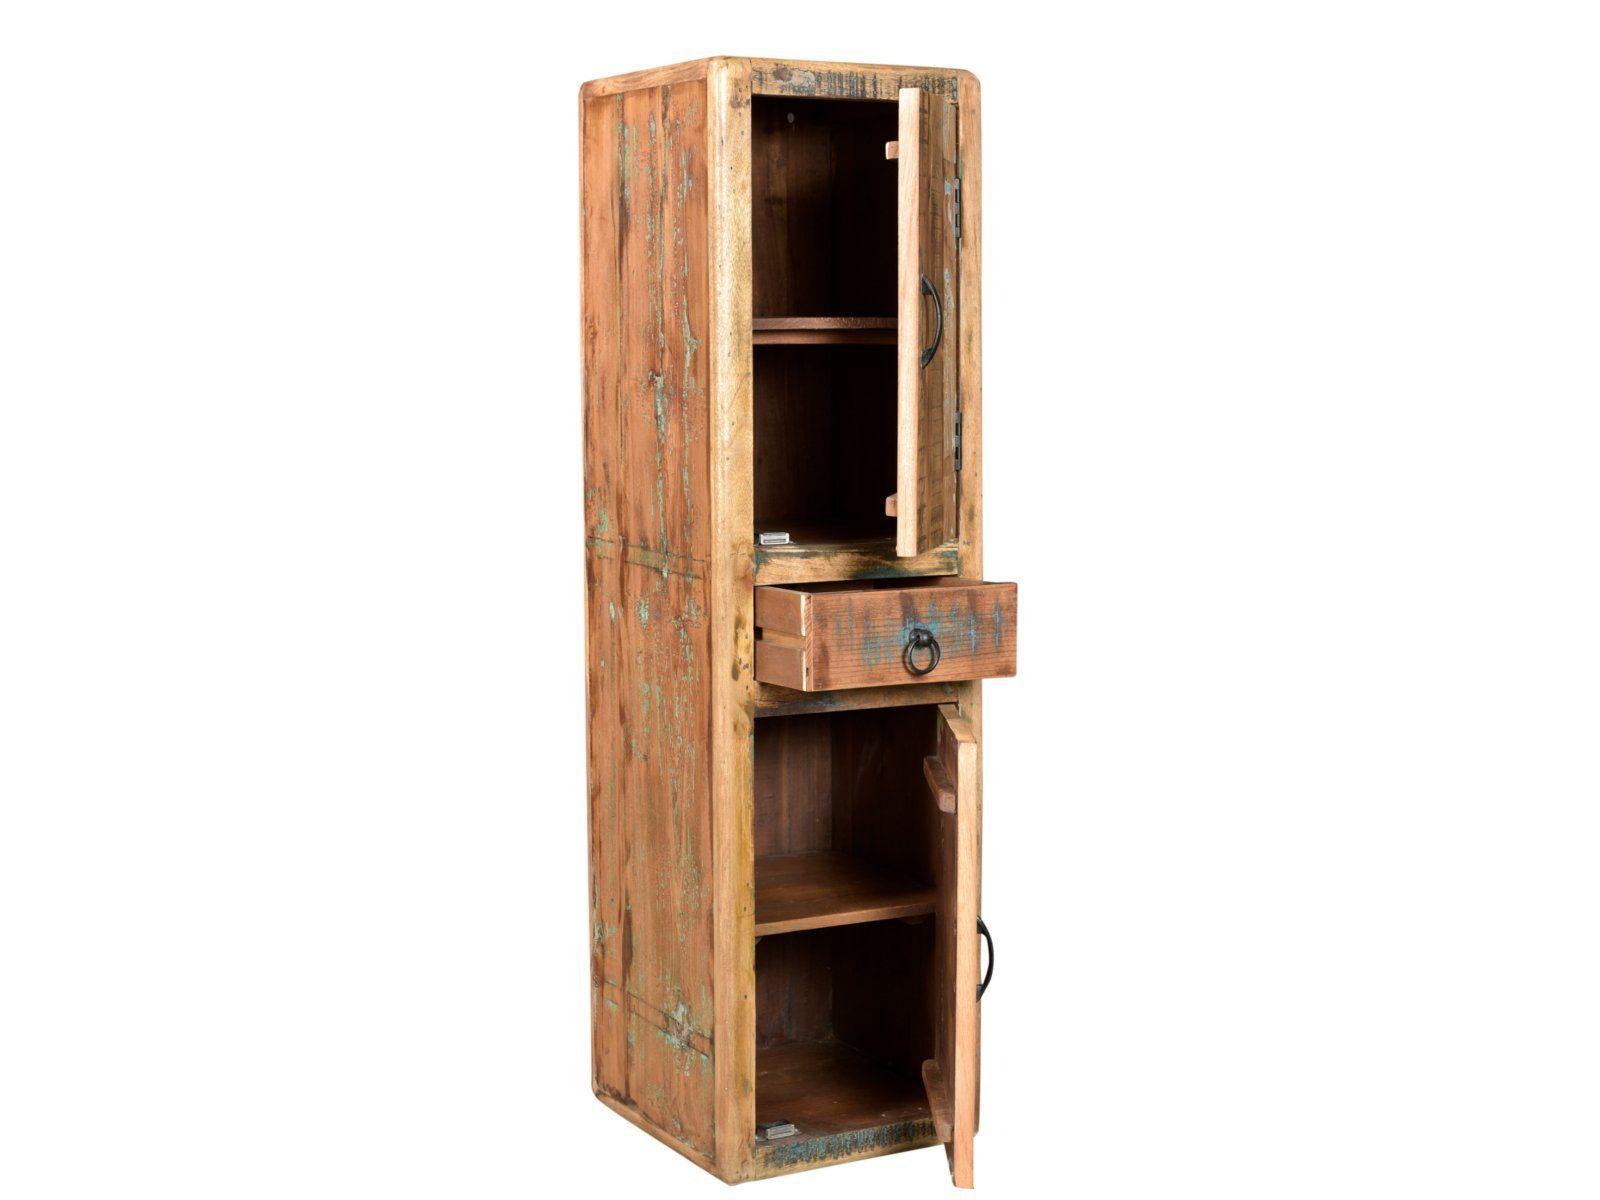 Woodkings Bad Hochschrank Kalkutta Recyceltes Holz Bunt Rustikal Hangebad Badhochschrank Massiv Badmobel Massivholz Ba Bad Hochschrank Hochschrank Wandschrank